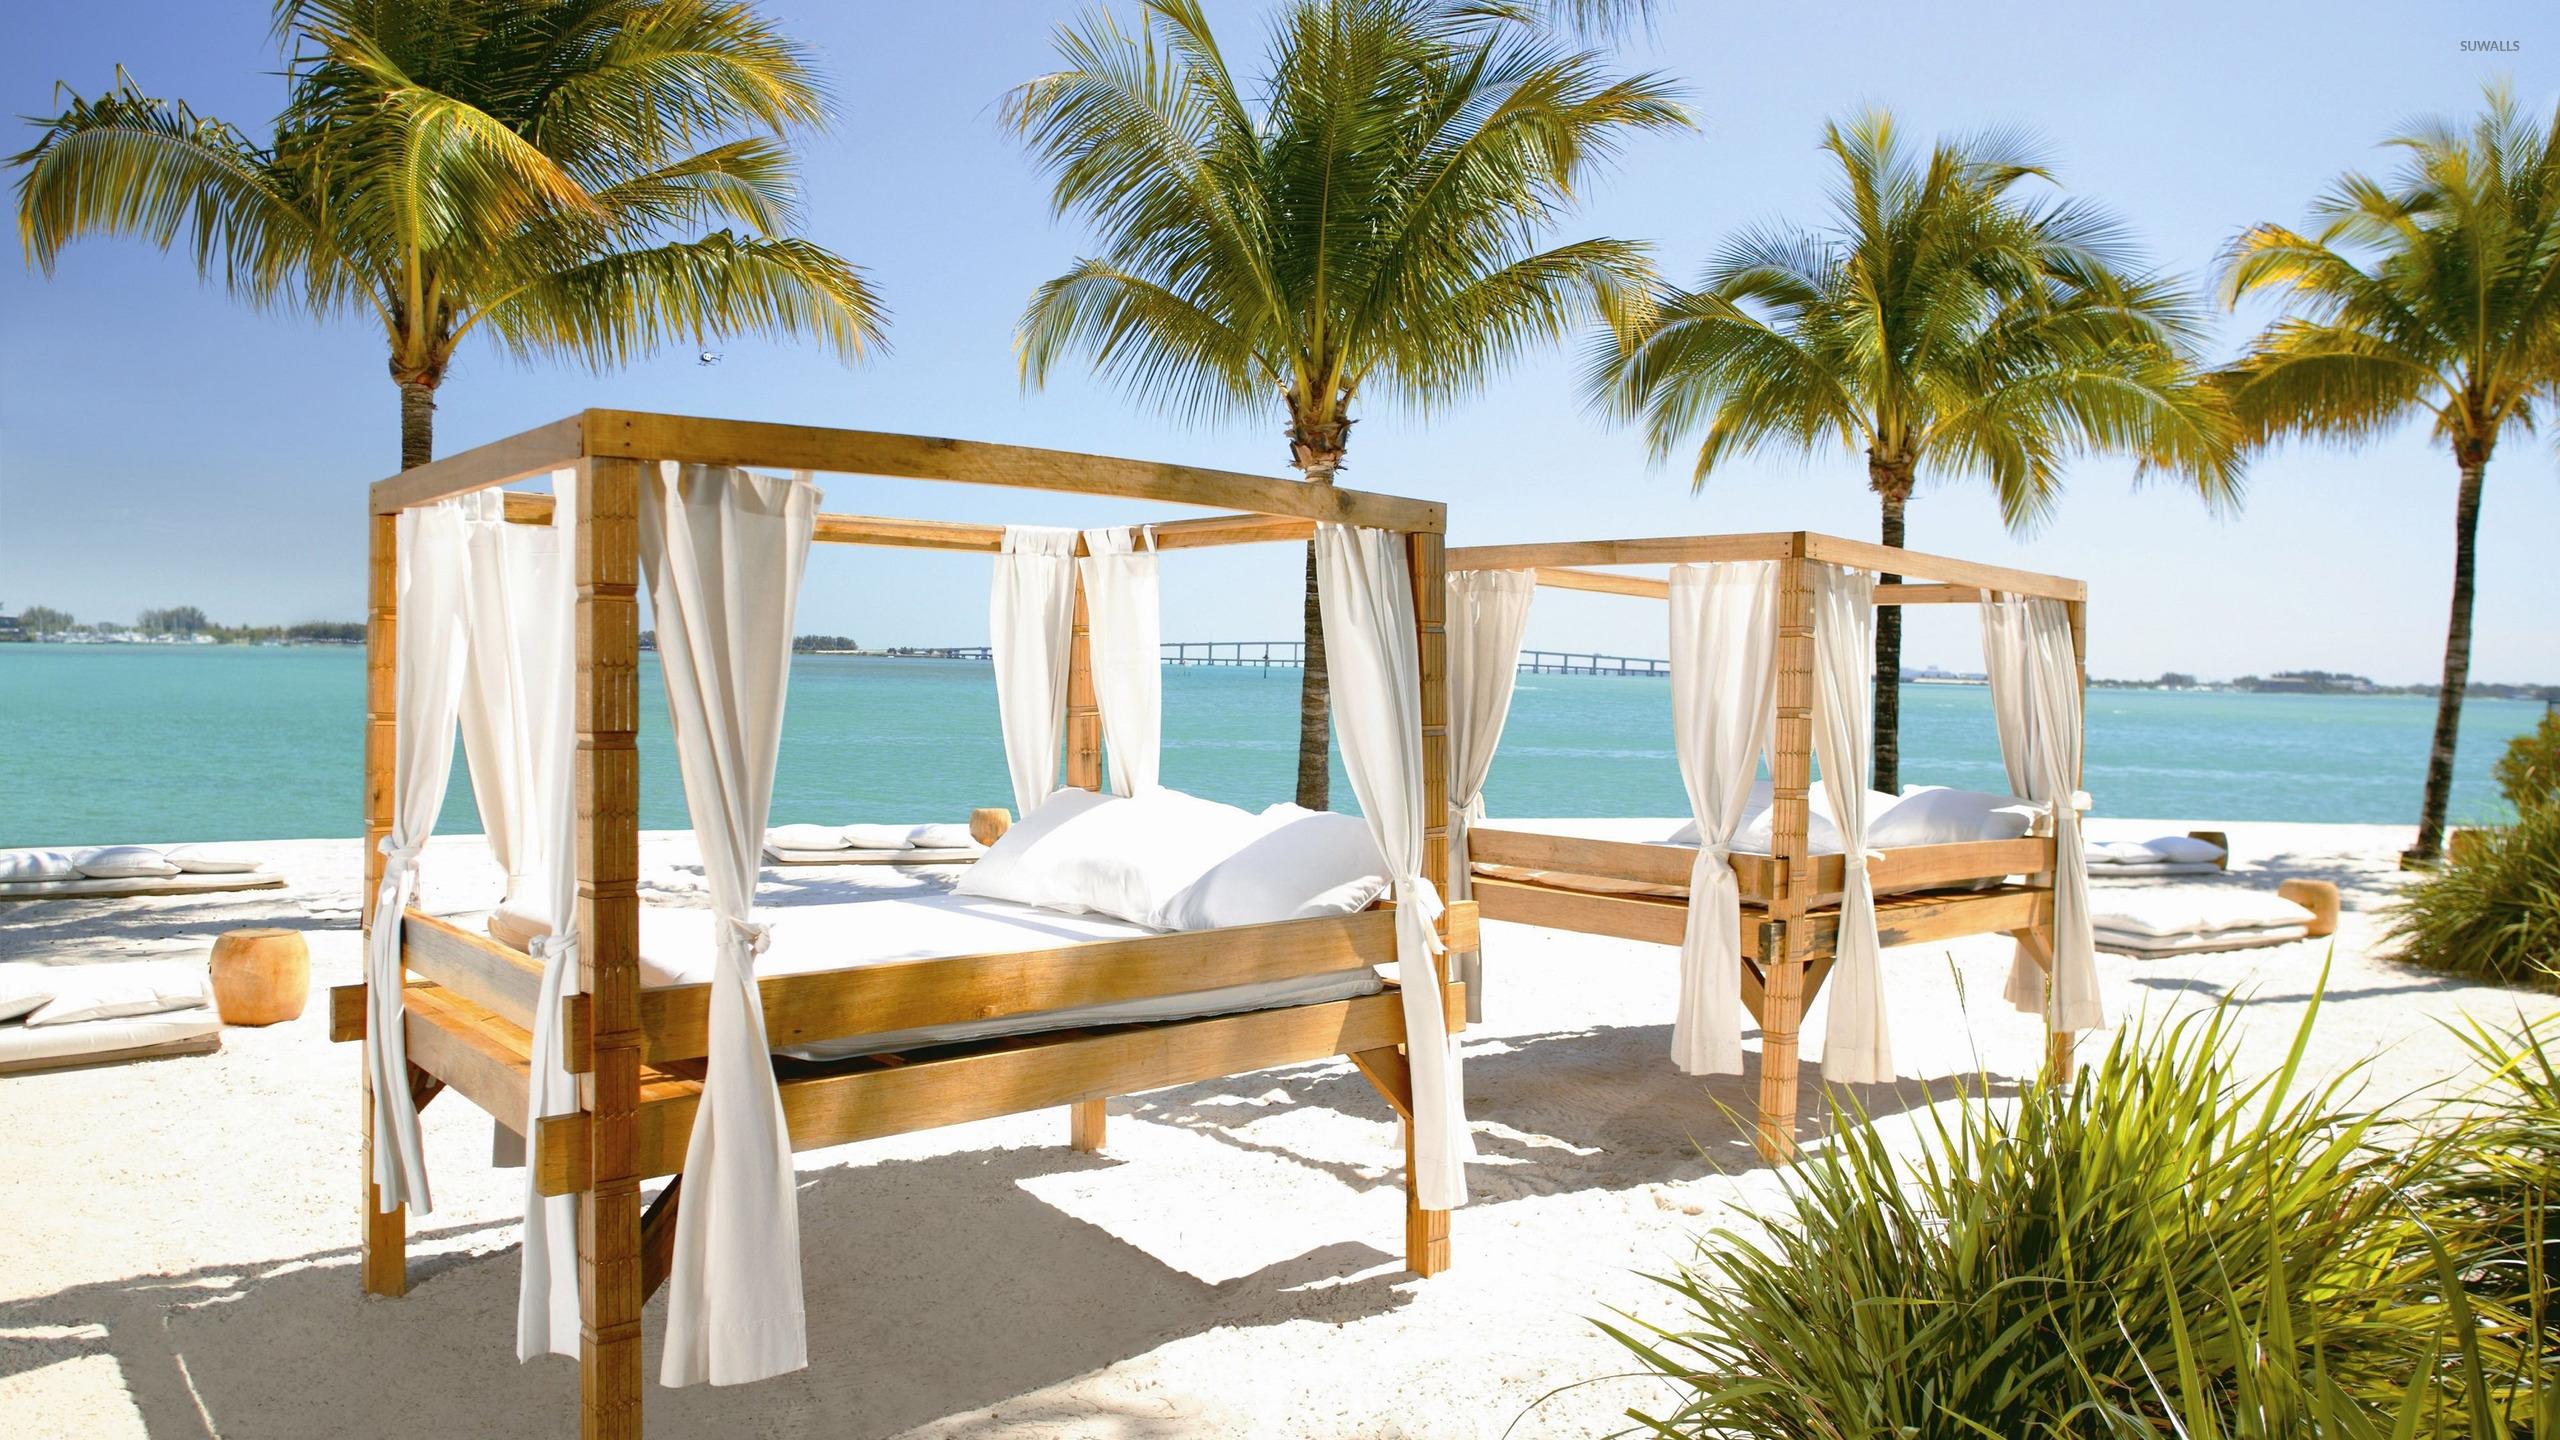 Beach Resort Wallpaper 21: Tropical Resort Wallpaper